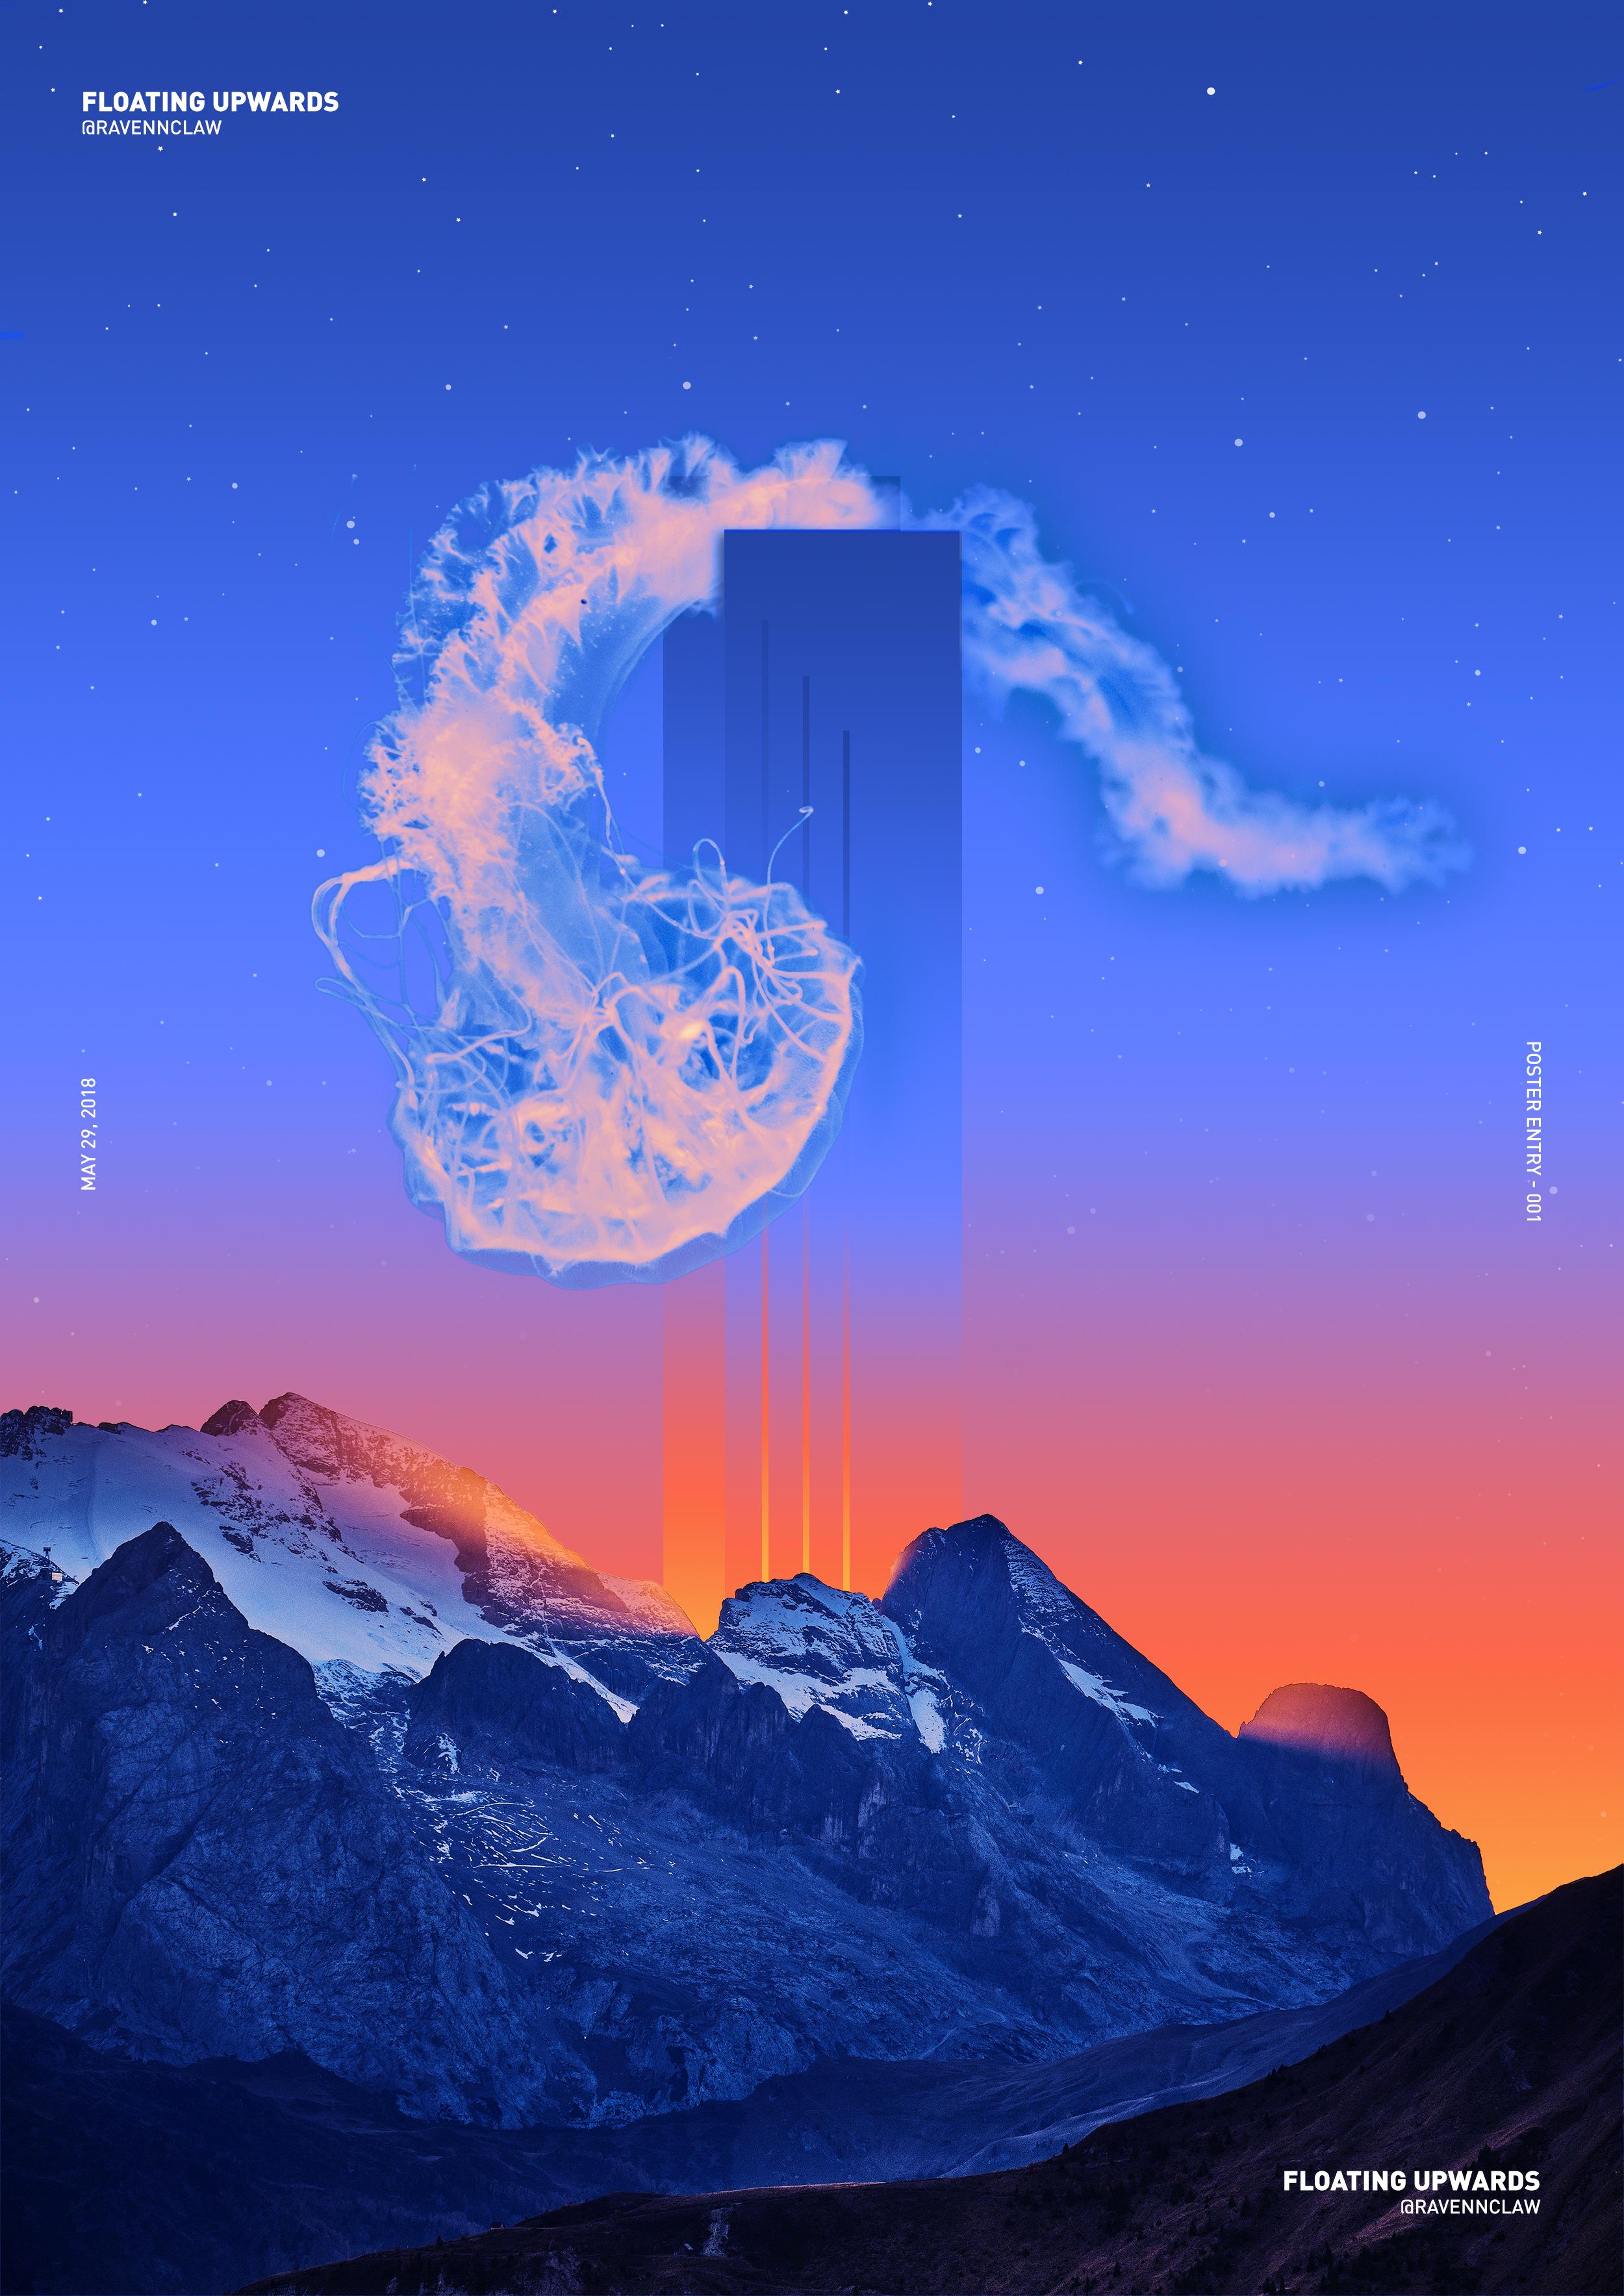 Poster-001-Floating-Upwards.jpg